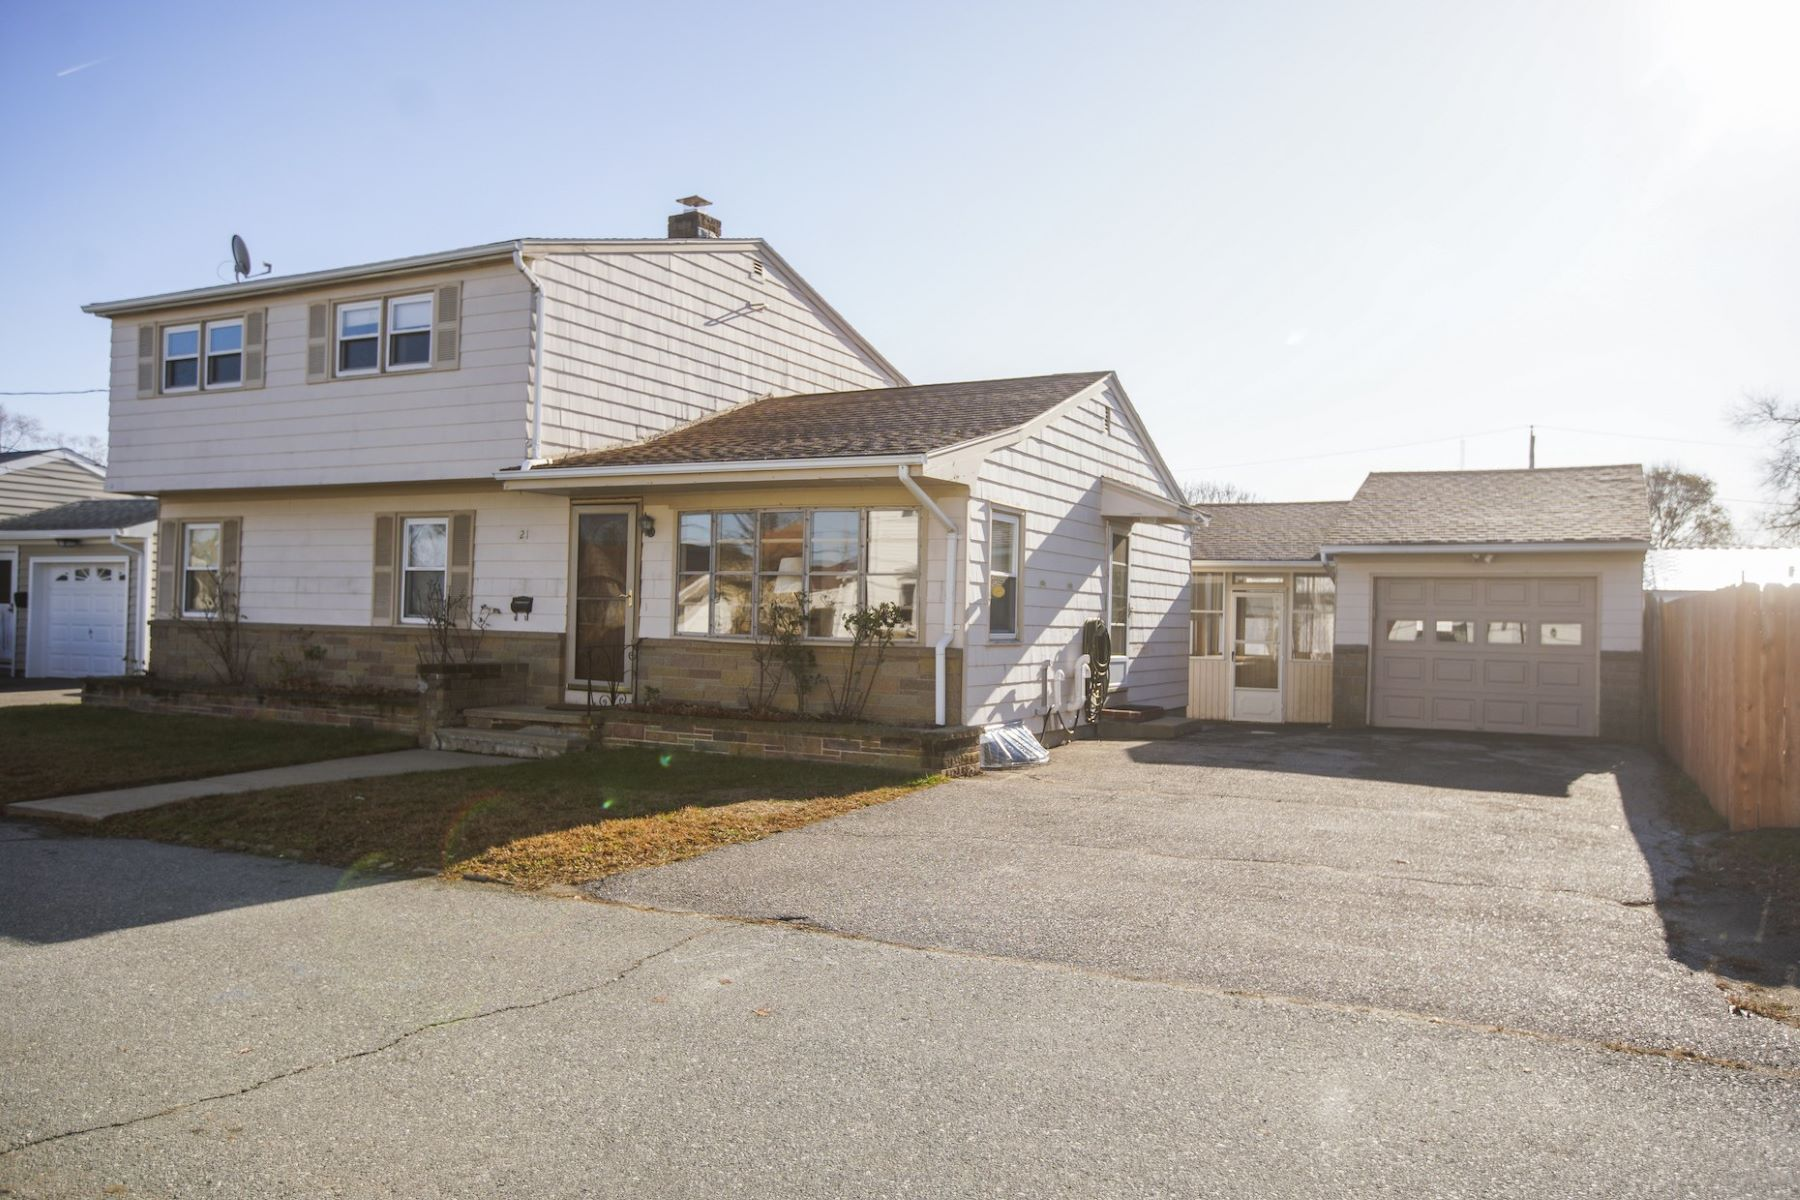 Single Family Homes for Sale at 21 Mozart Street, Cranston, RI Cranston, Rhode Island 02920 United States